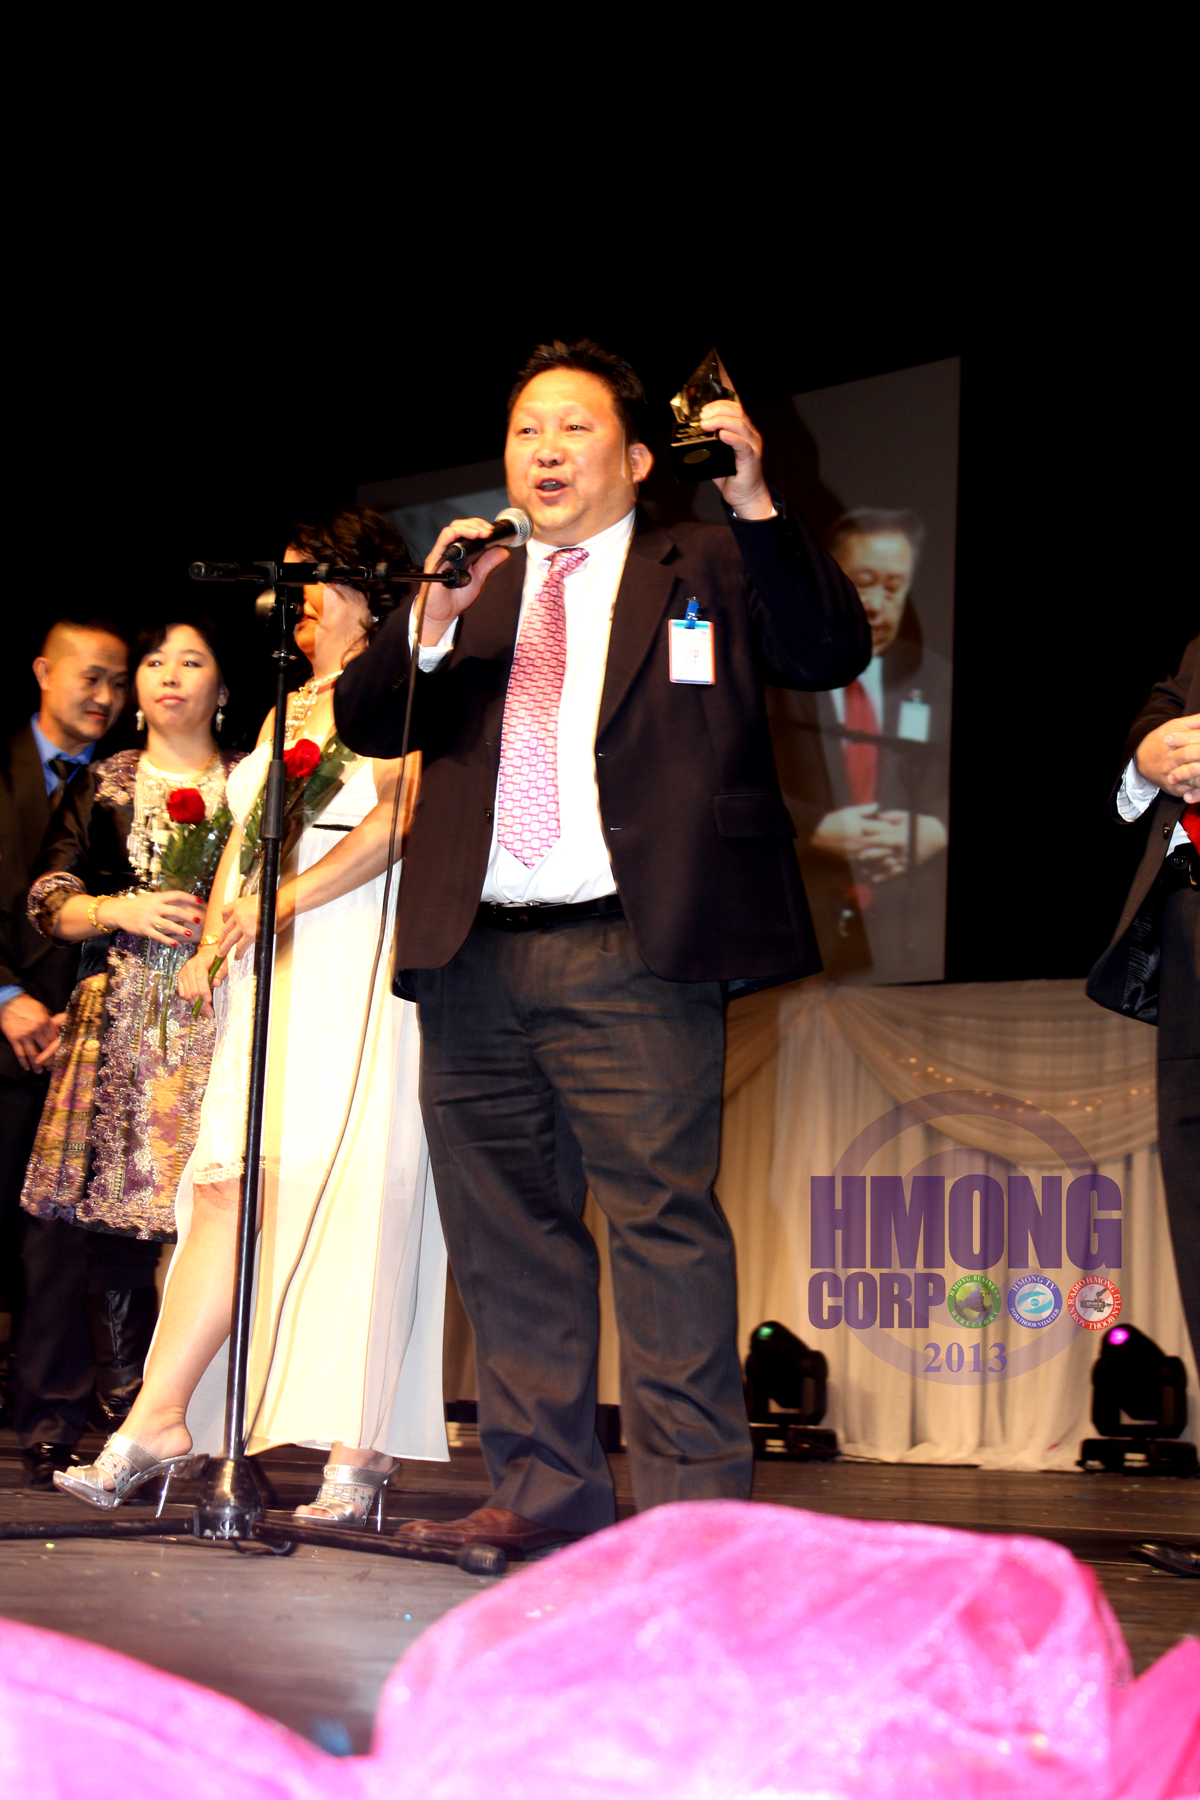 Pao Koua Yang, husband of